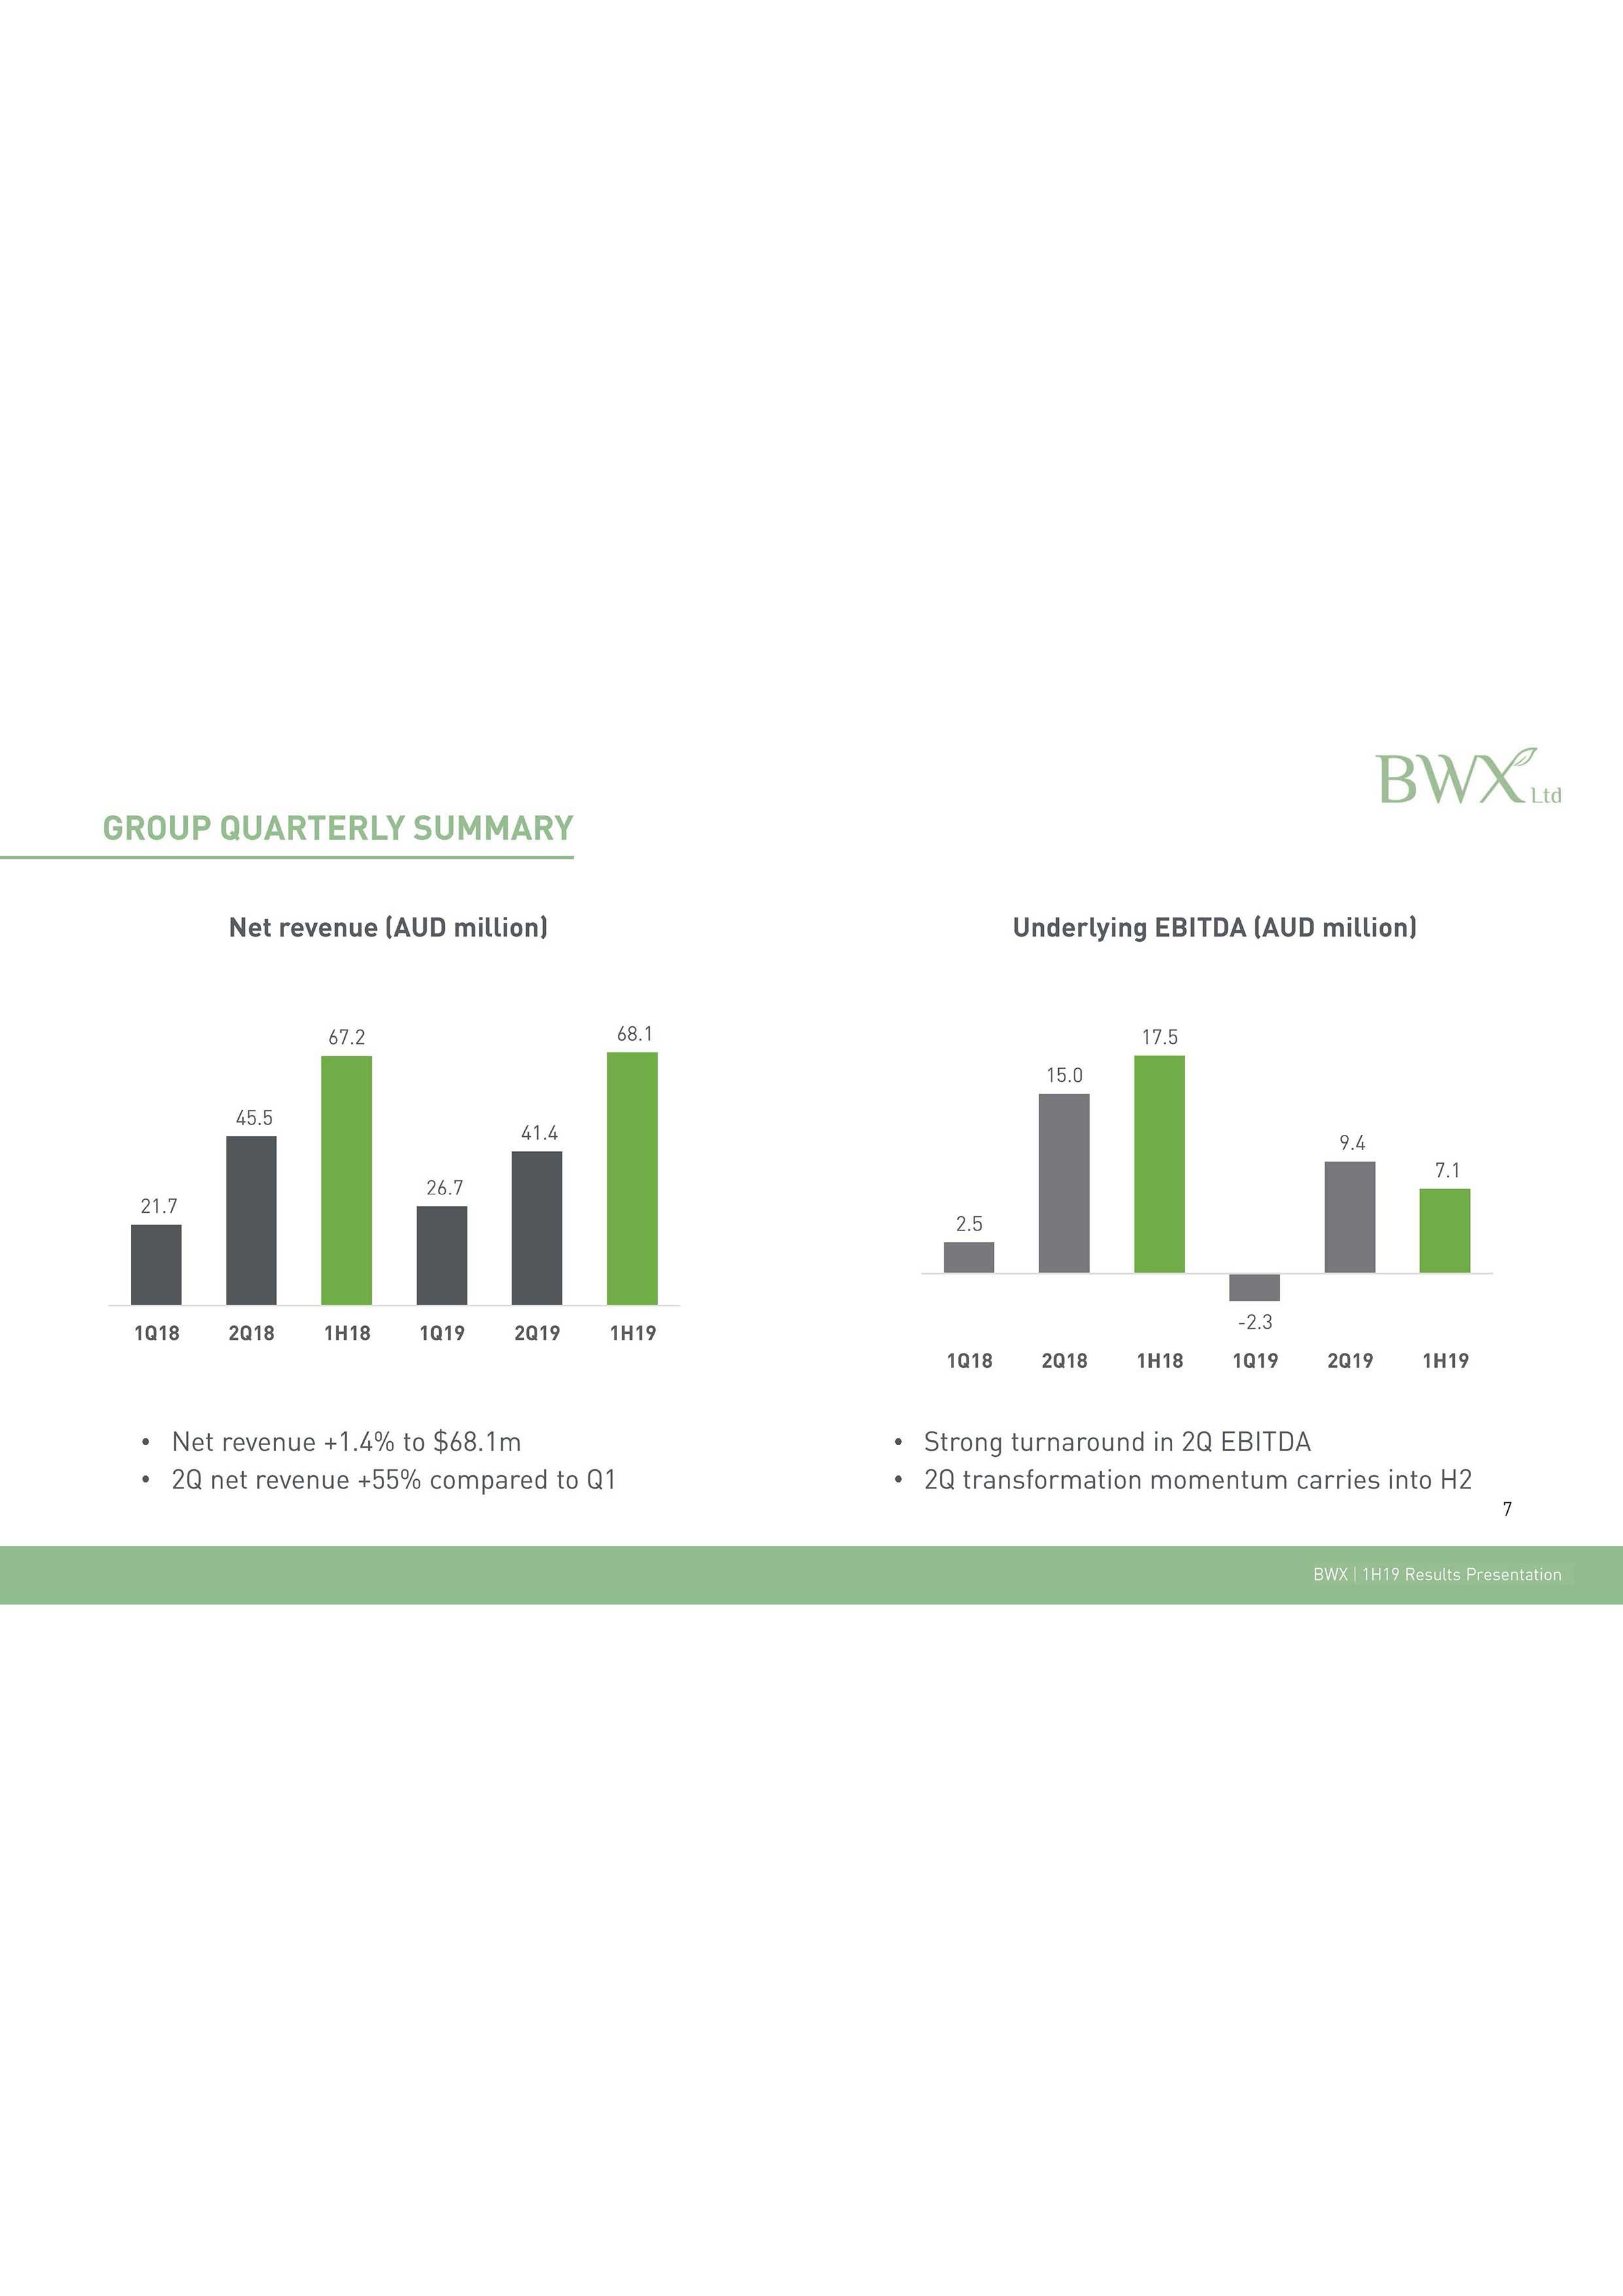 BWX Ltd - H1FY19 Results Presentation - Page7